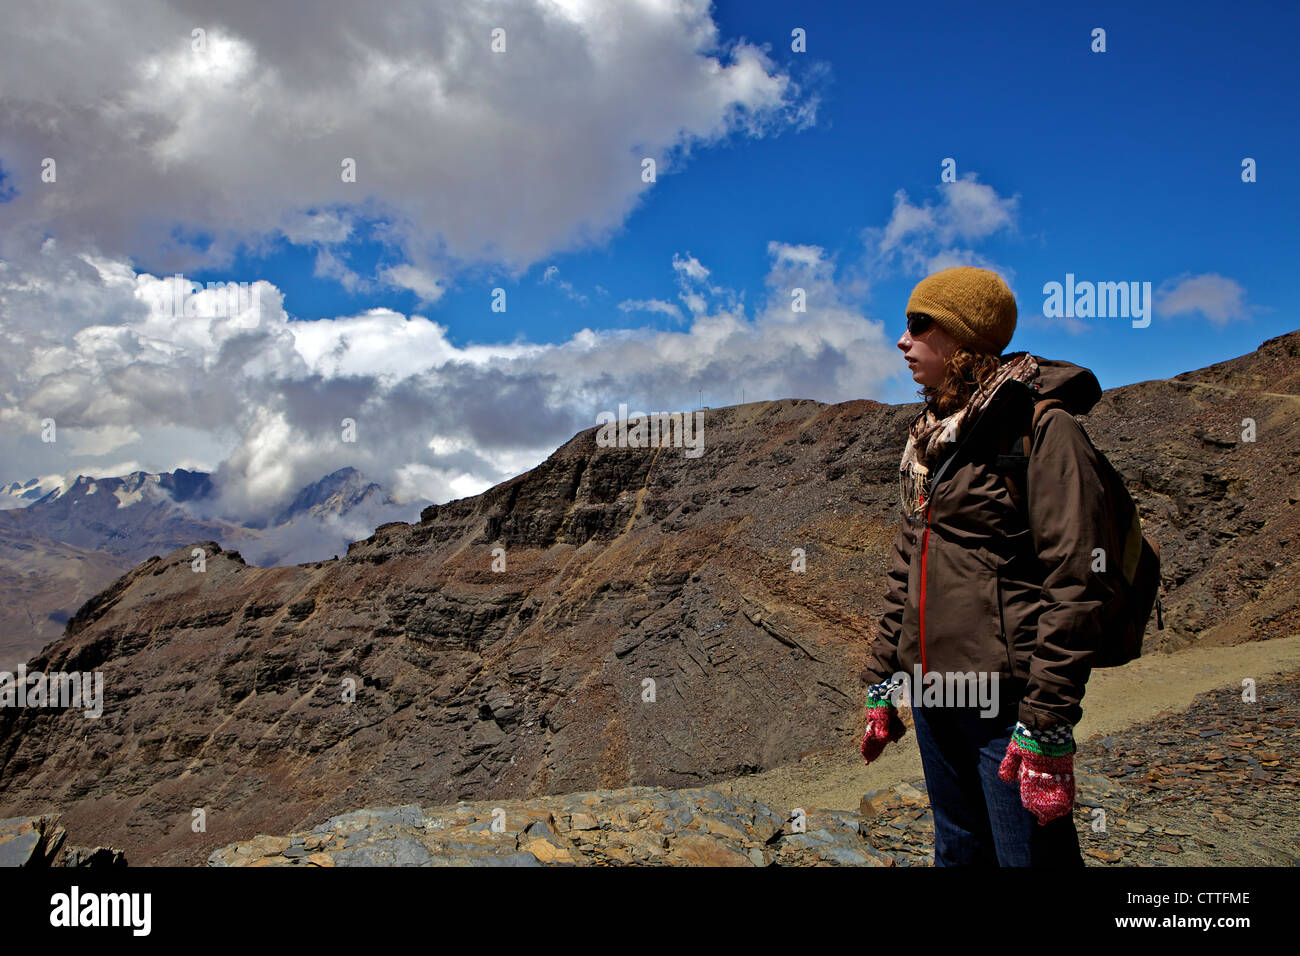 Mt. Chacaltaya, Calahuyo, Cordillera real, Bolivia, Andes, South America, (the Altiplano, high plateau near La Paz) - Stock Image